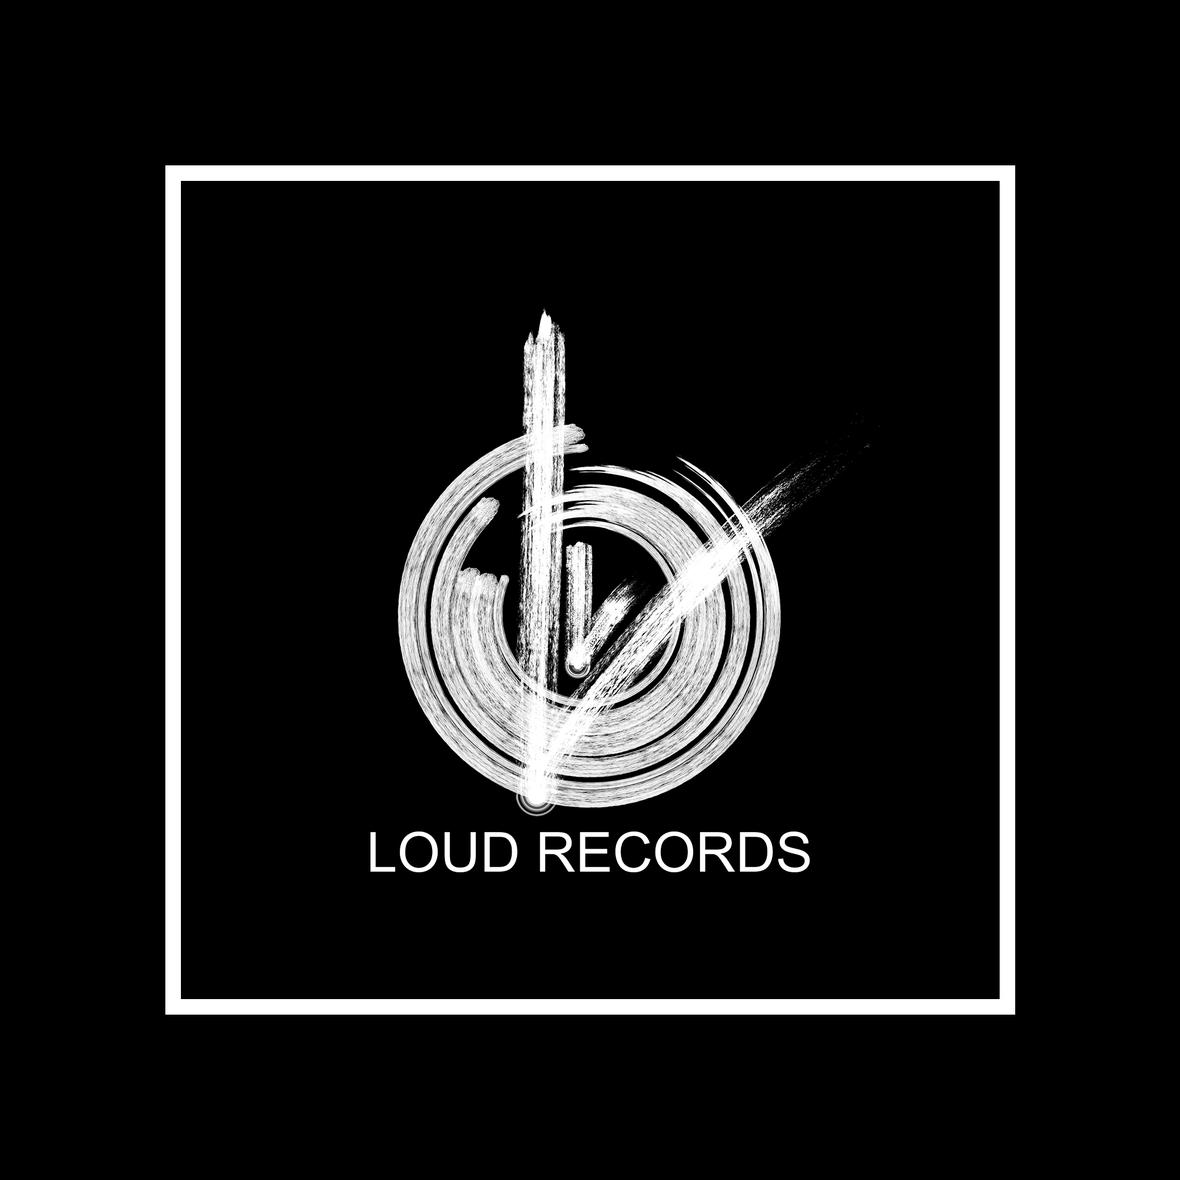 Loud Records 1 Black